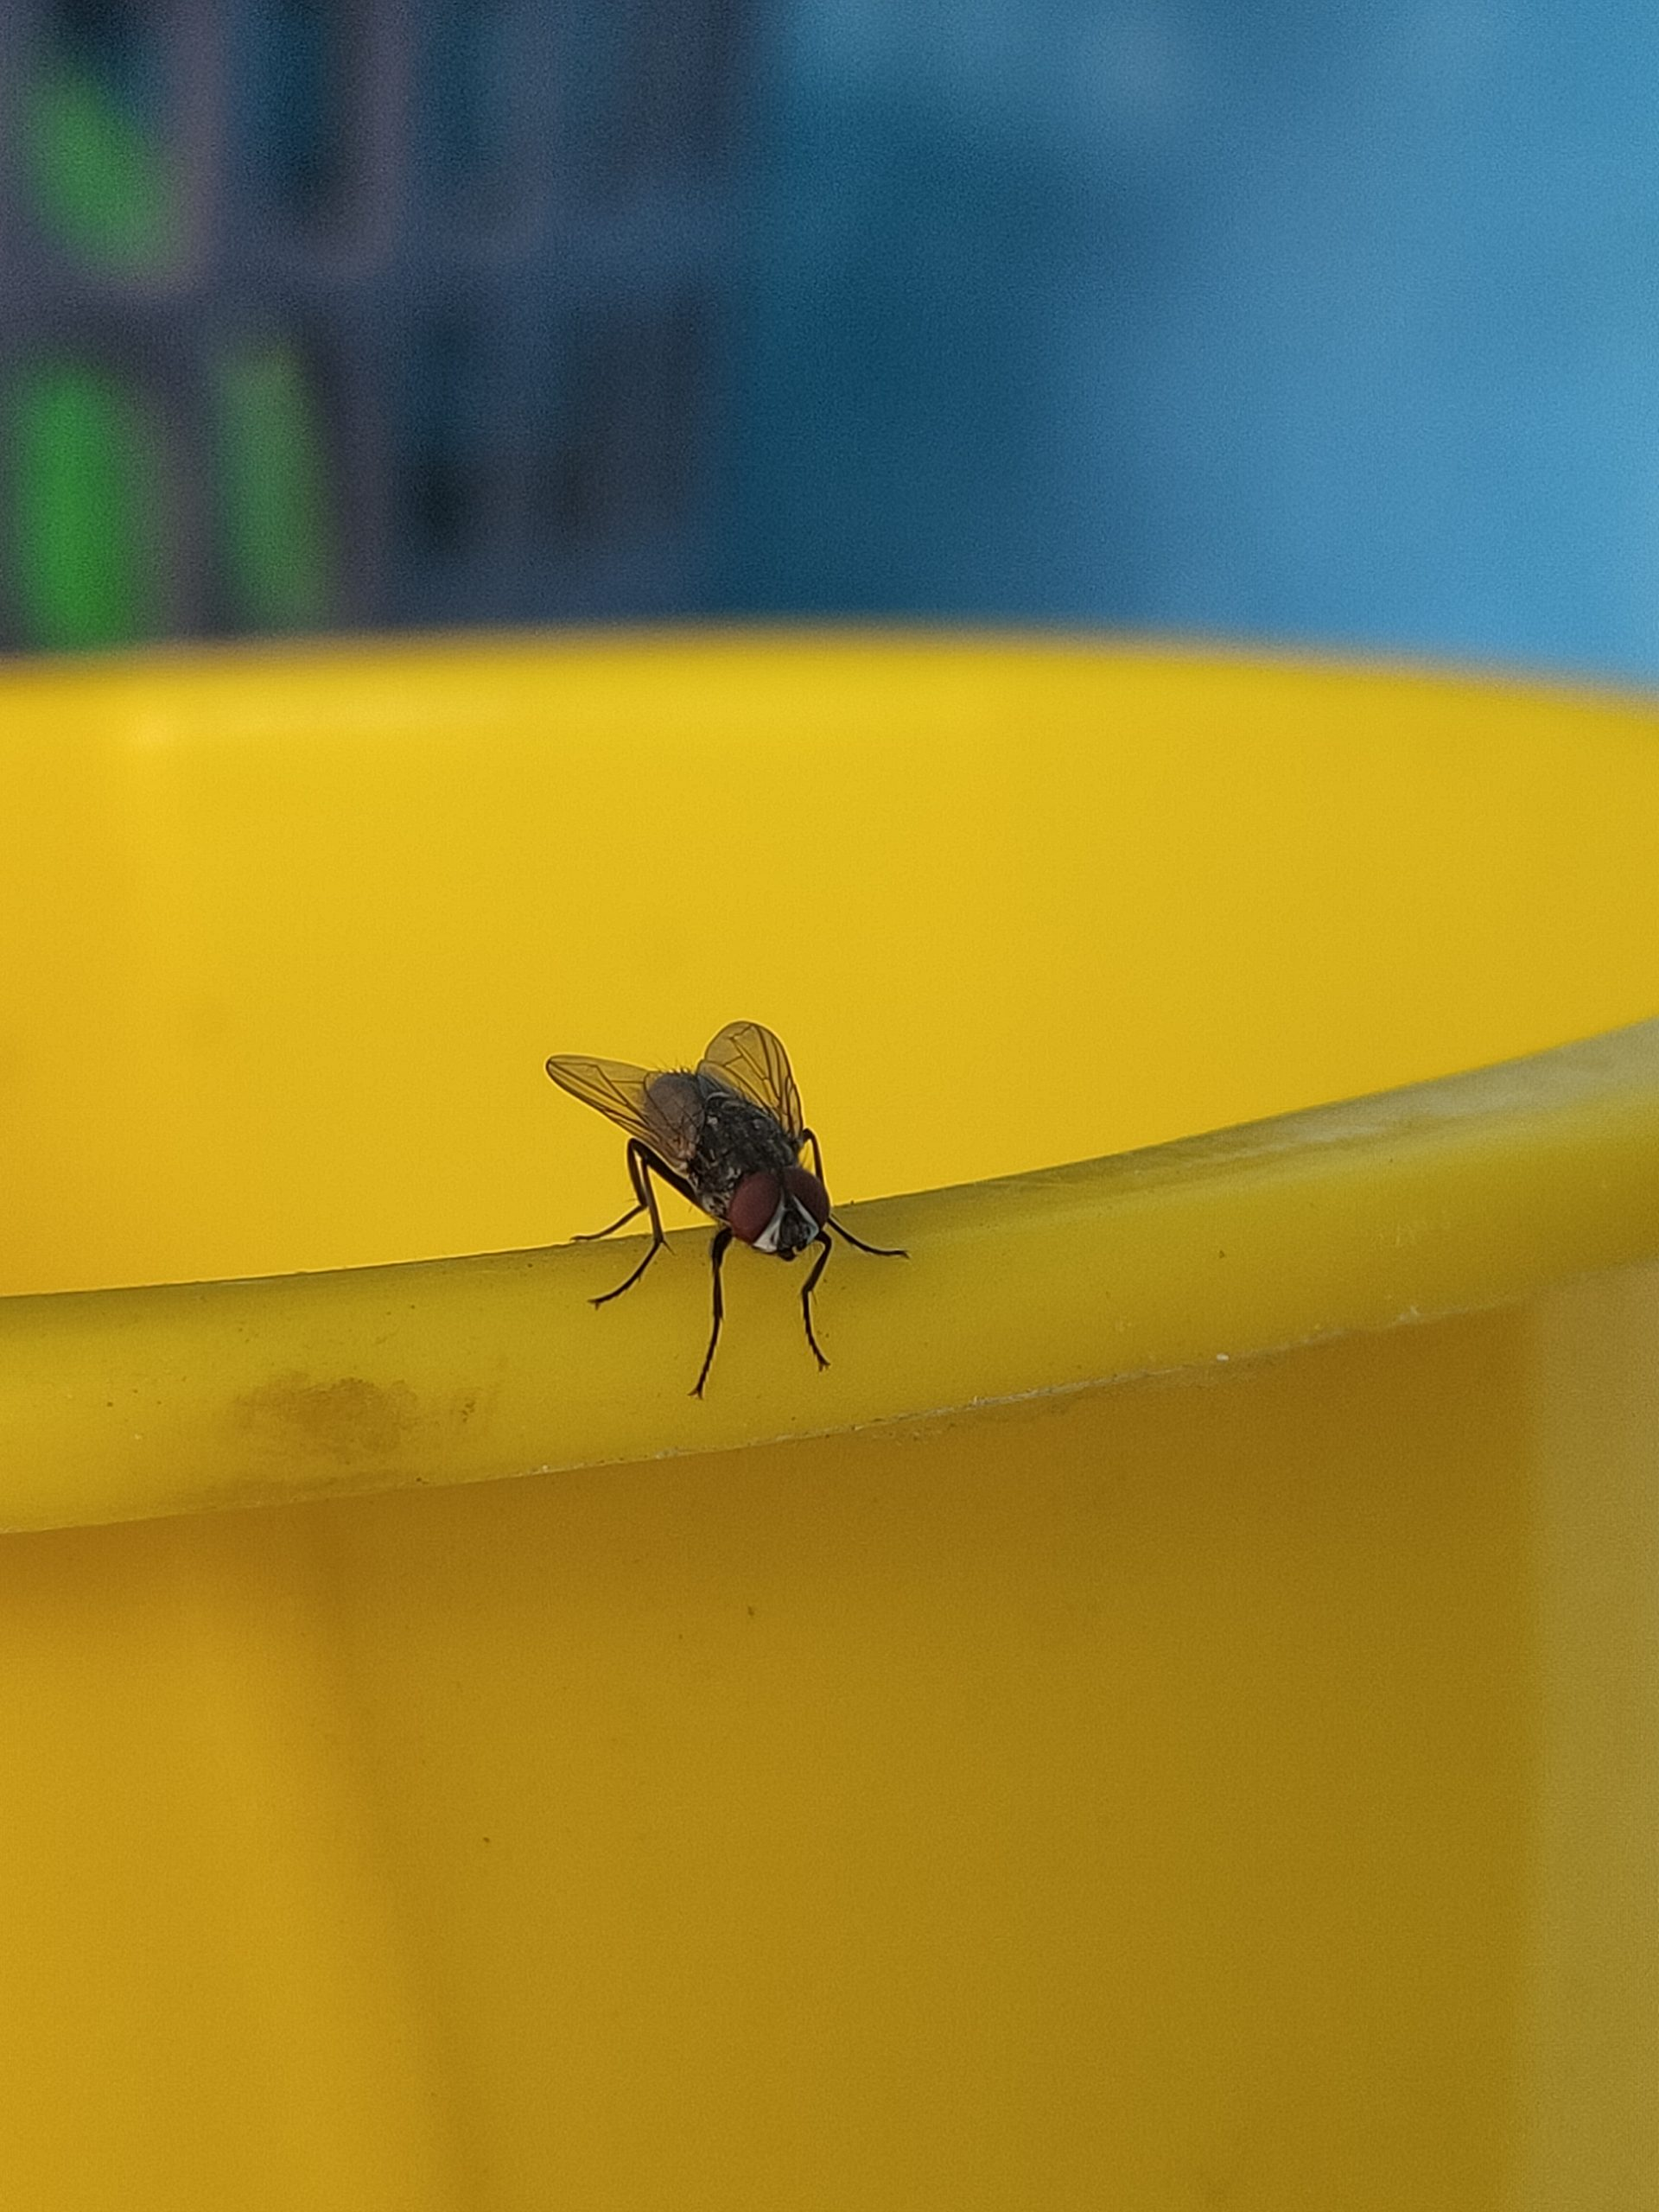 Housefly on plastic tub